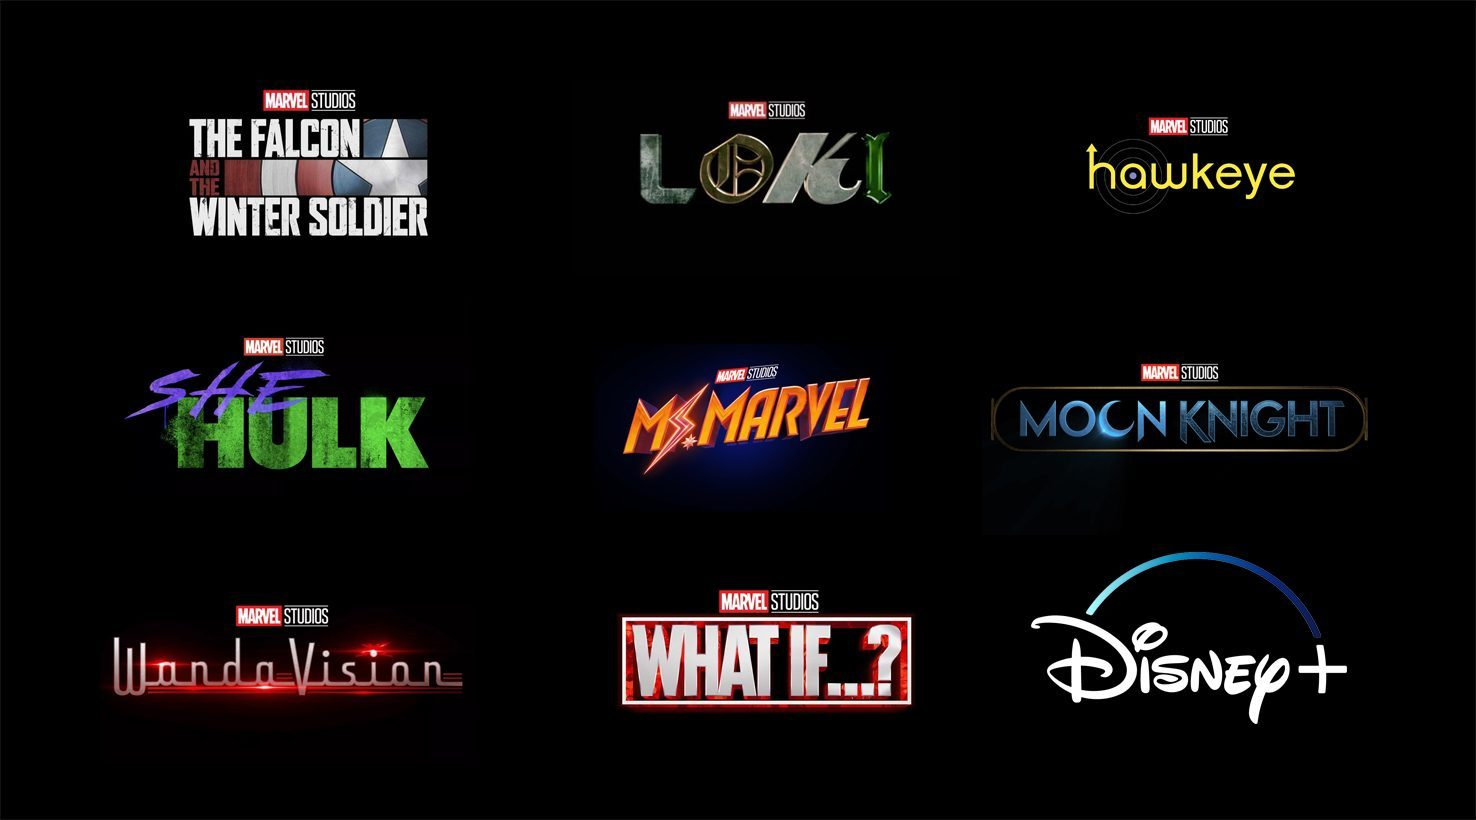 Disney+ Marvel Shows list